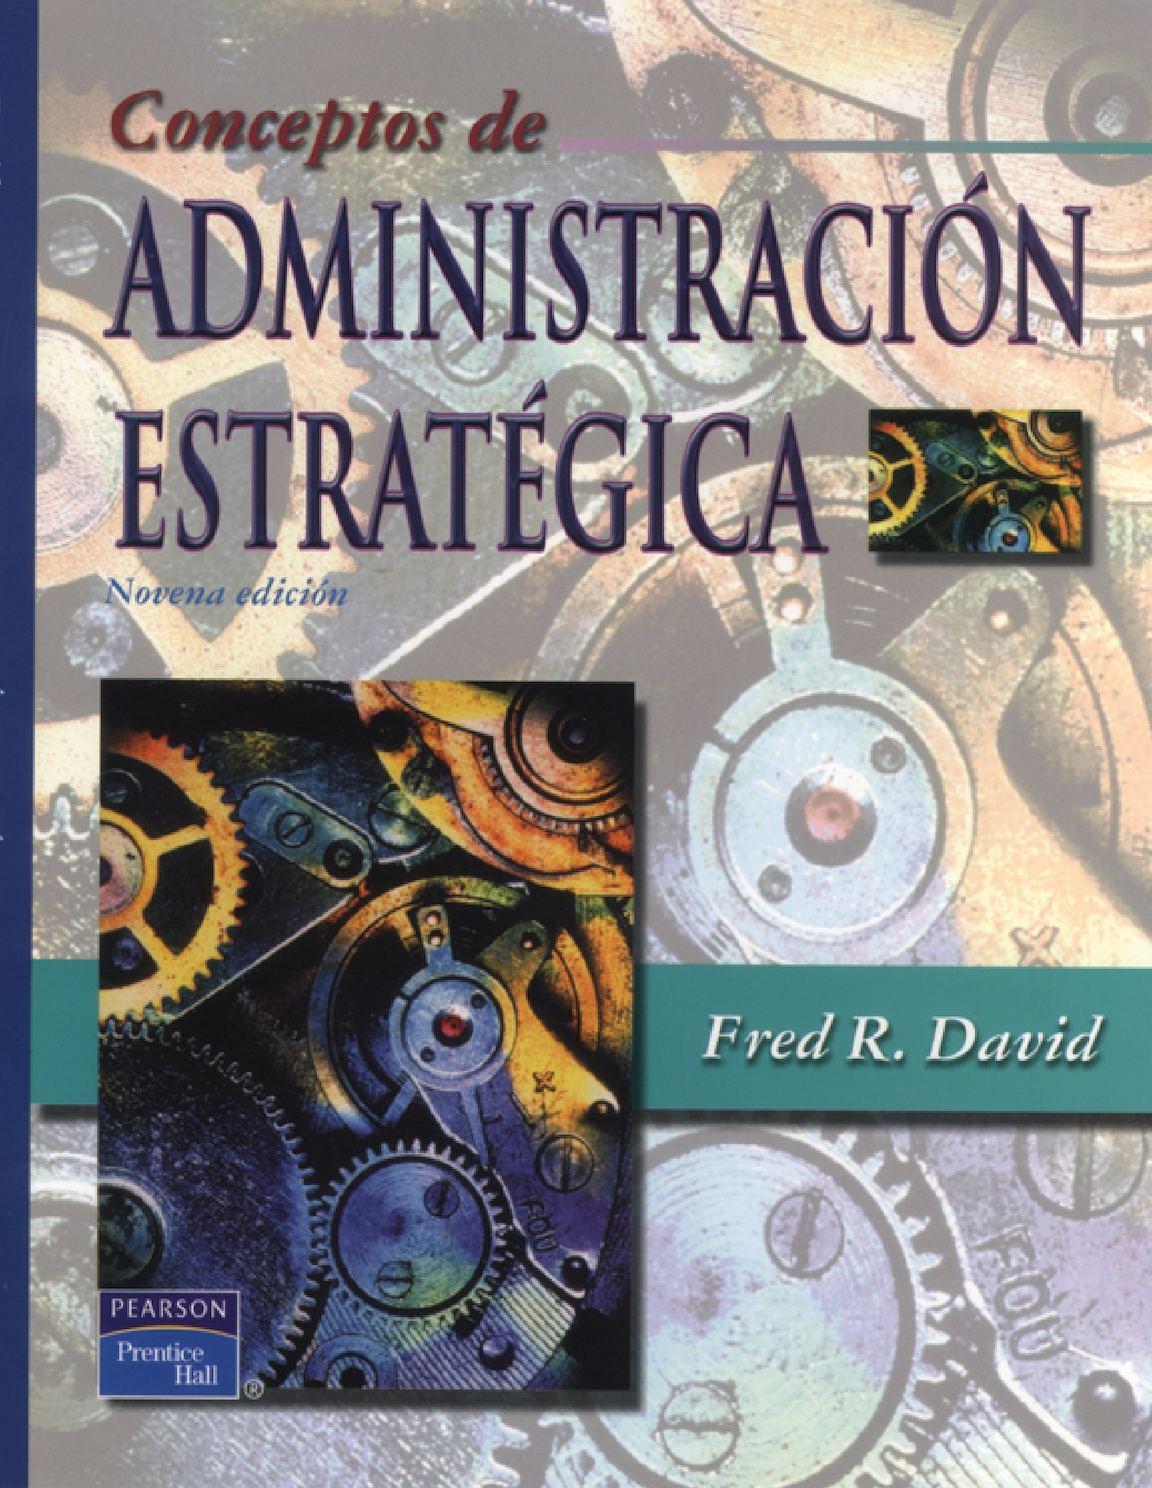 Calaméo - Estrategica Fred David